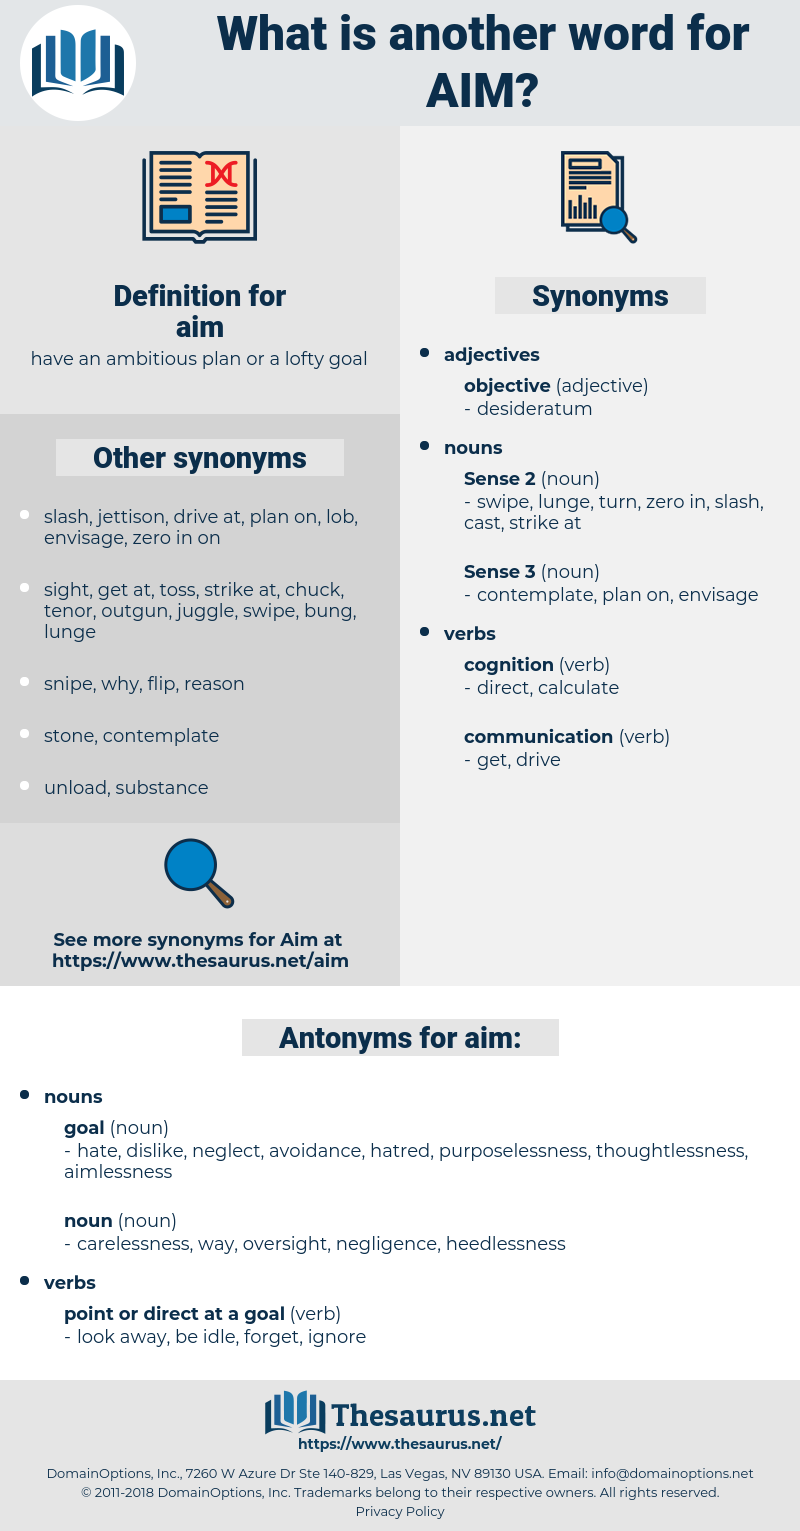 aim, synonym aim, another word for aim, words like aim, thesaurus aim